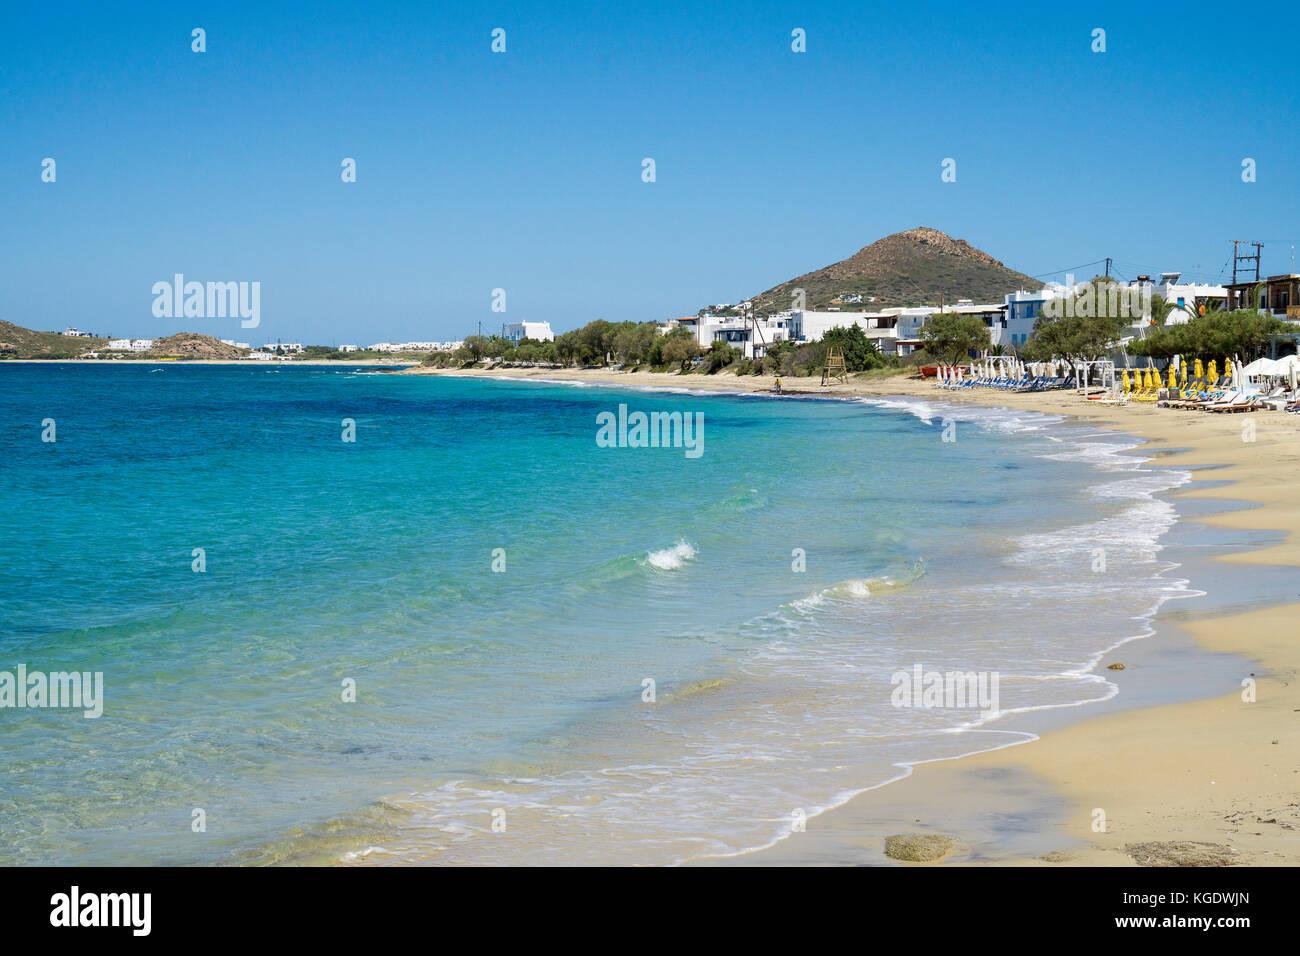 Beach of Agios Prokopios, west side of Naxos island, Cyclades, Aegean, Greece Stock Photo